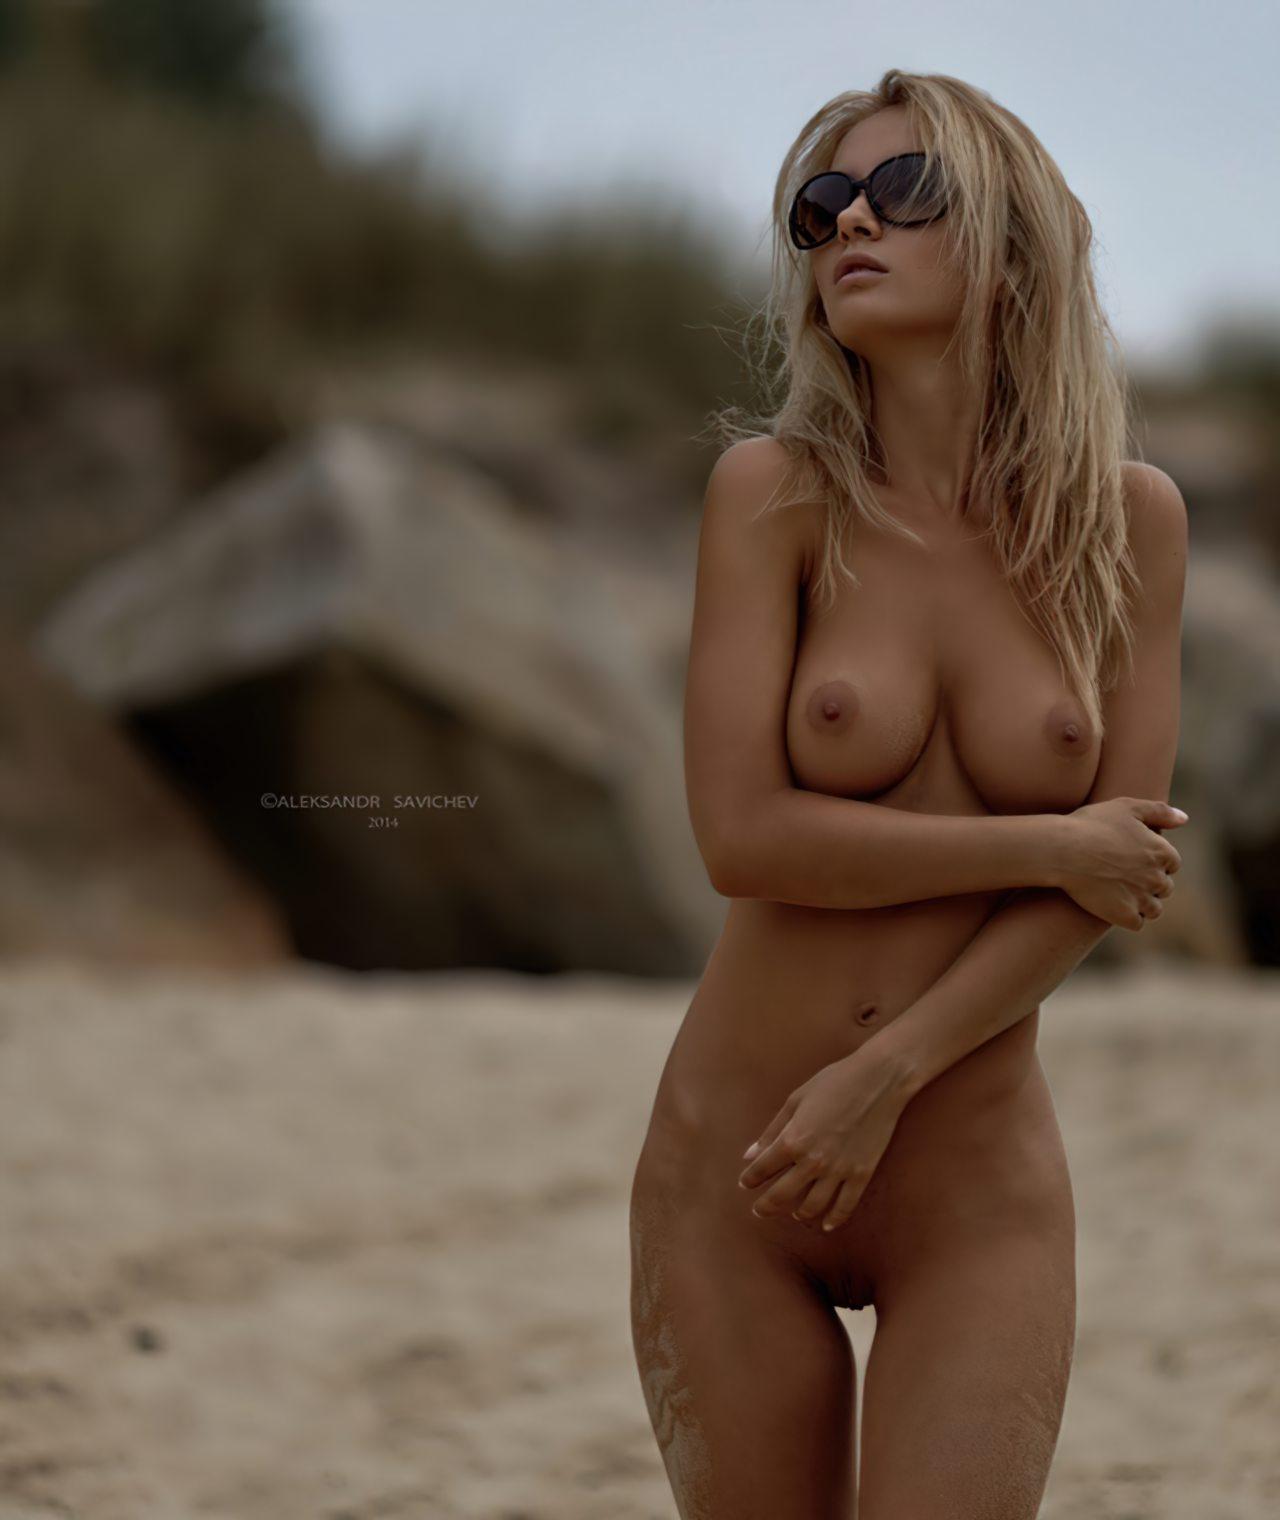 Mulheres Nuas Fotos (14)